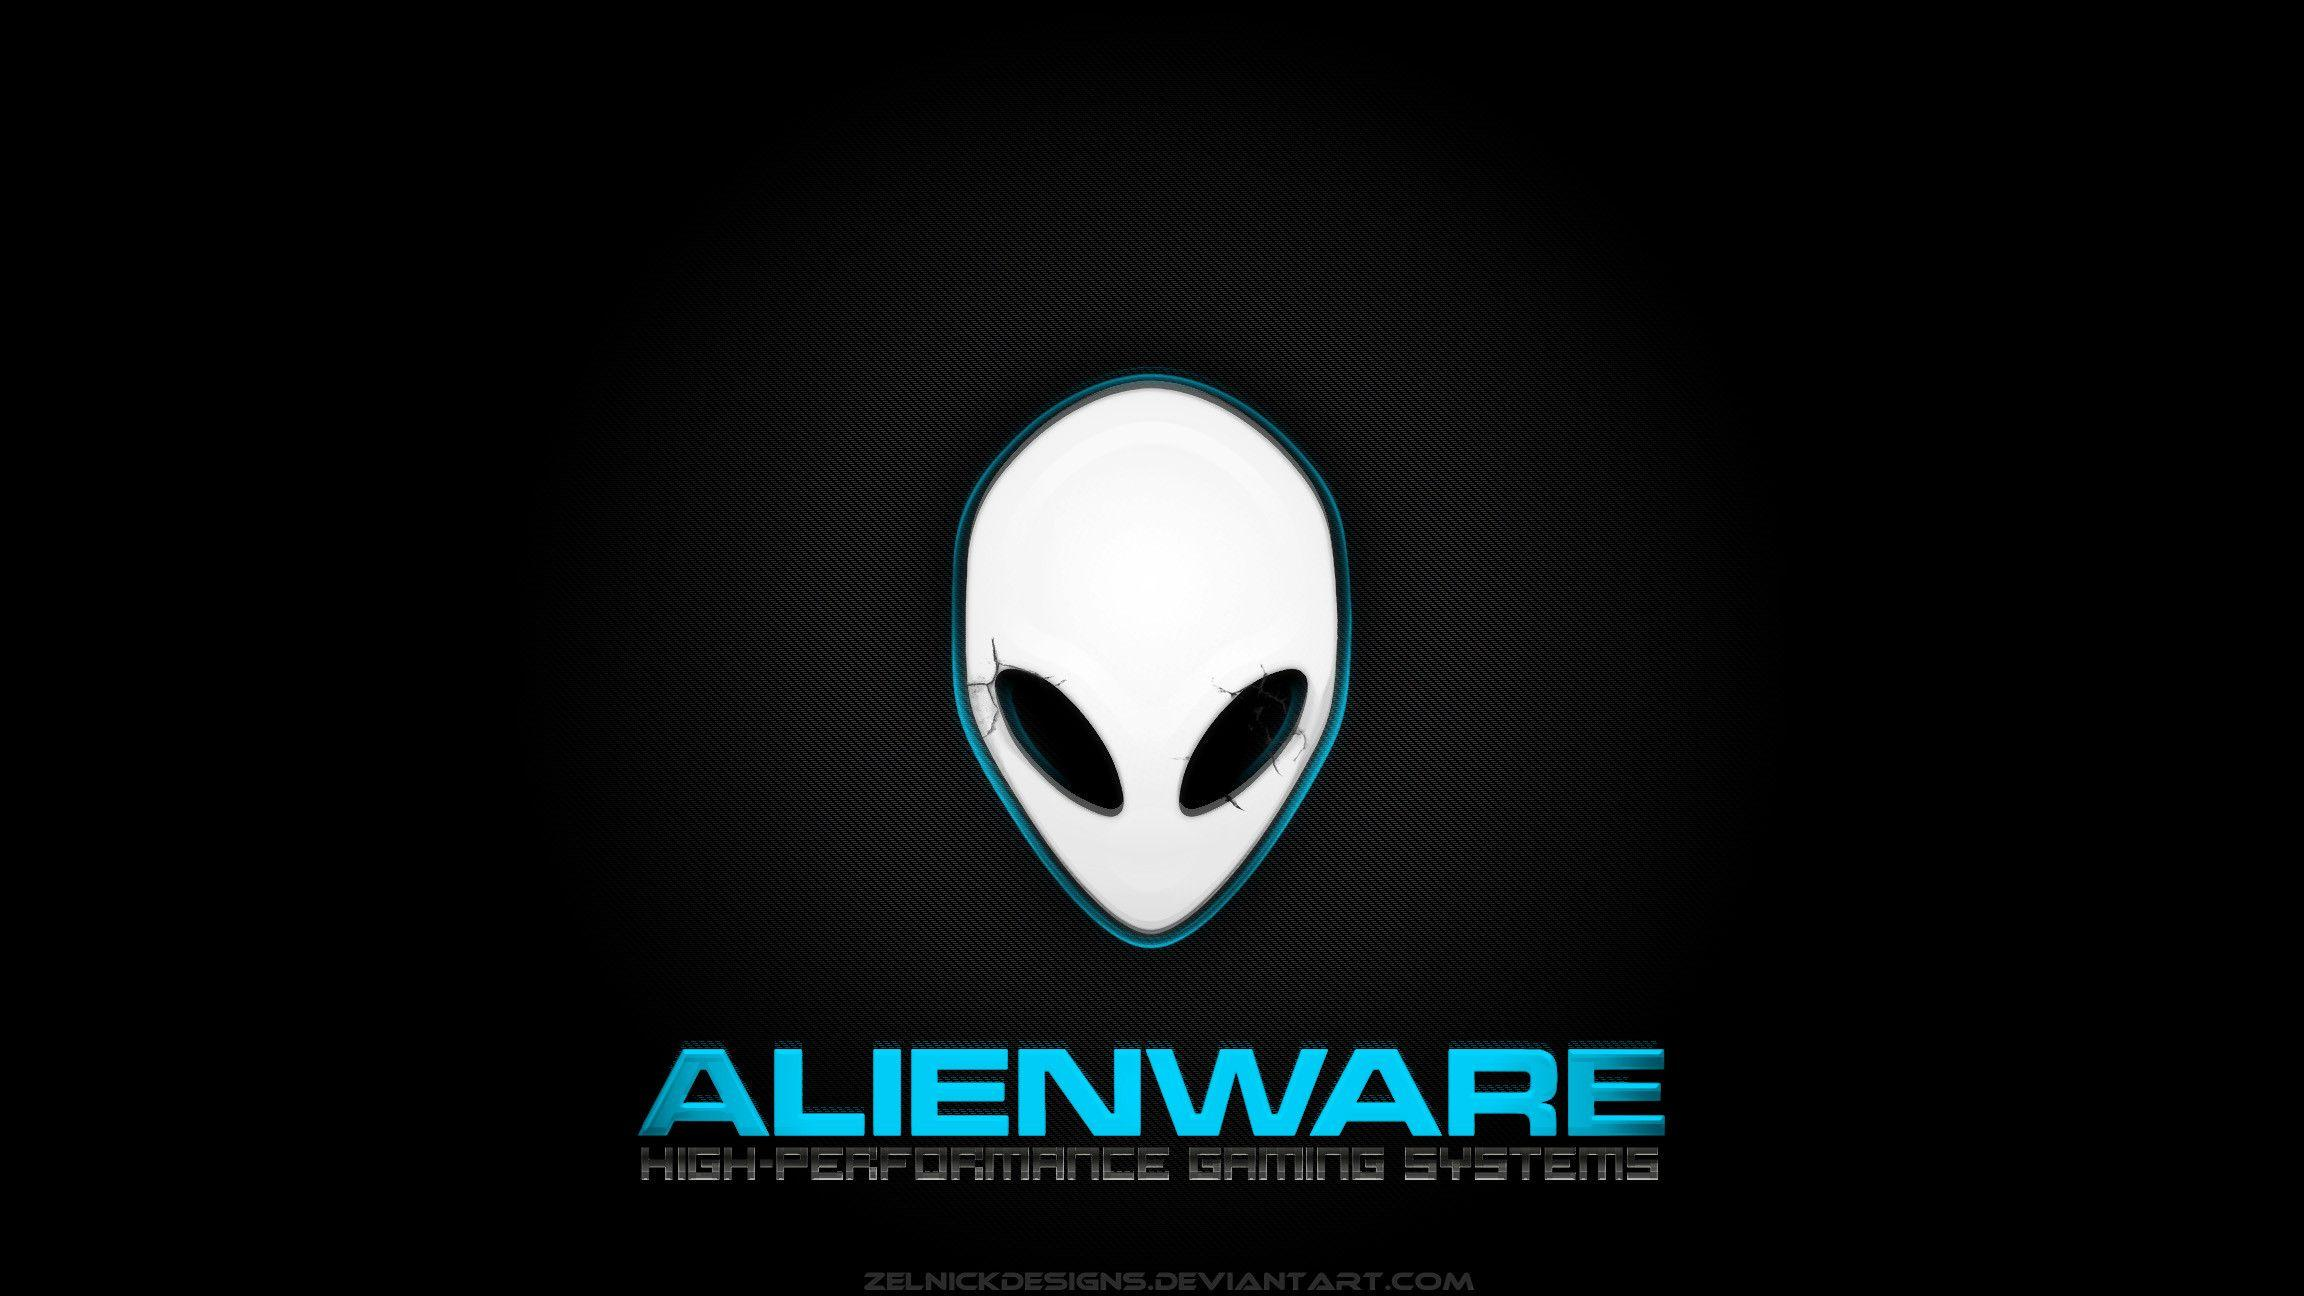 alienware wallpapers pack wallpaper cave